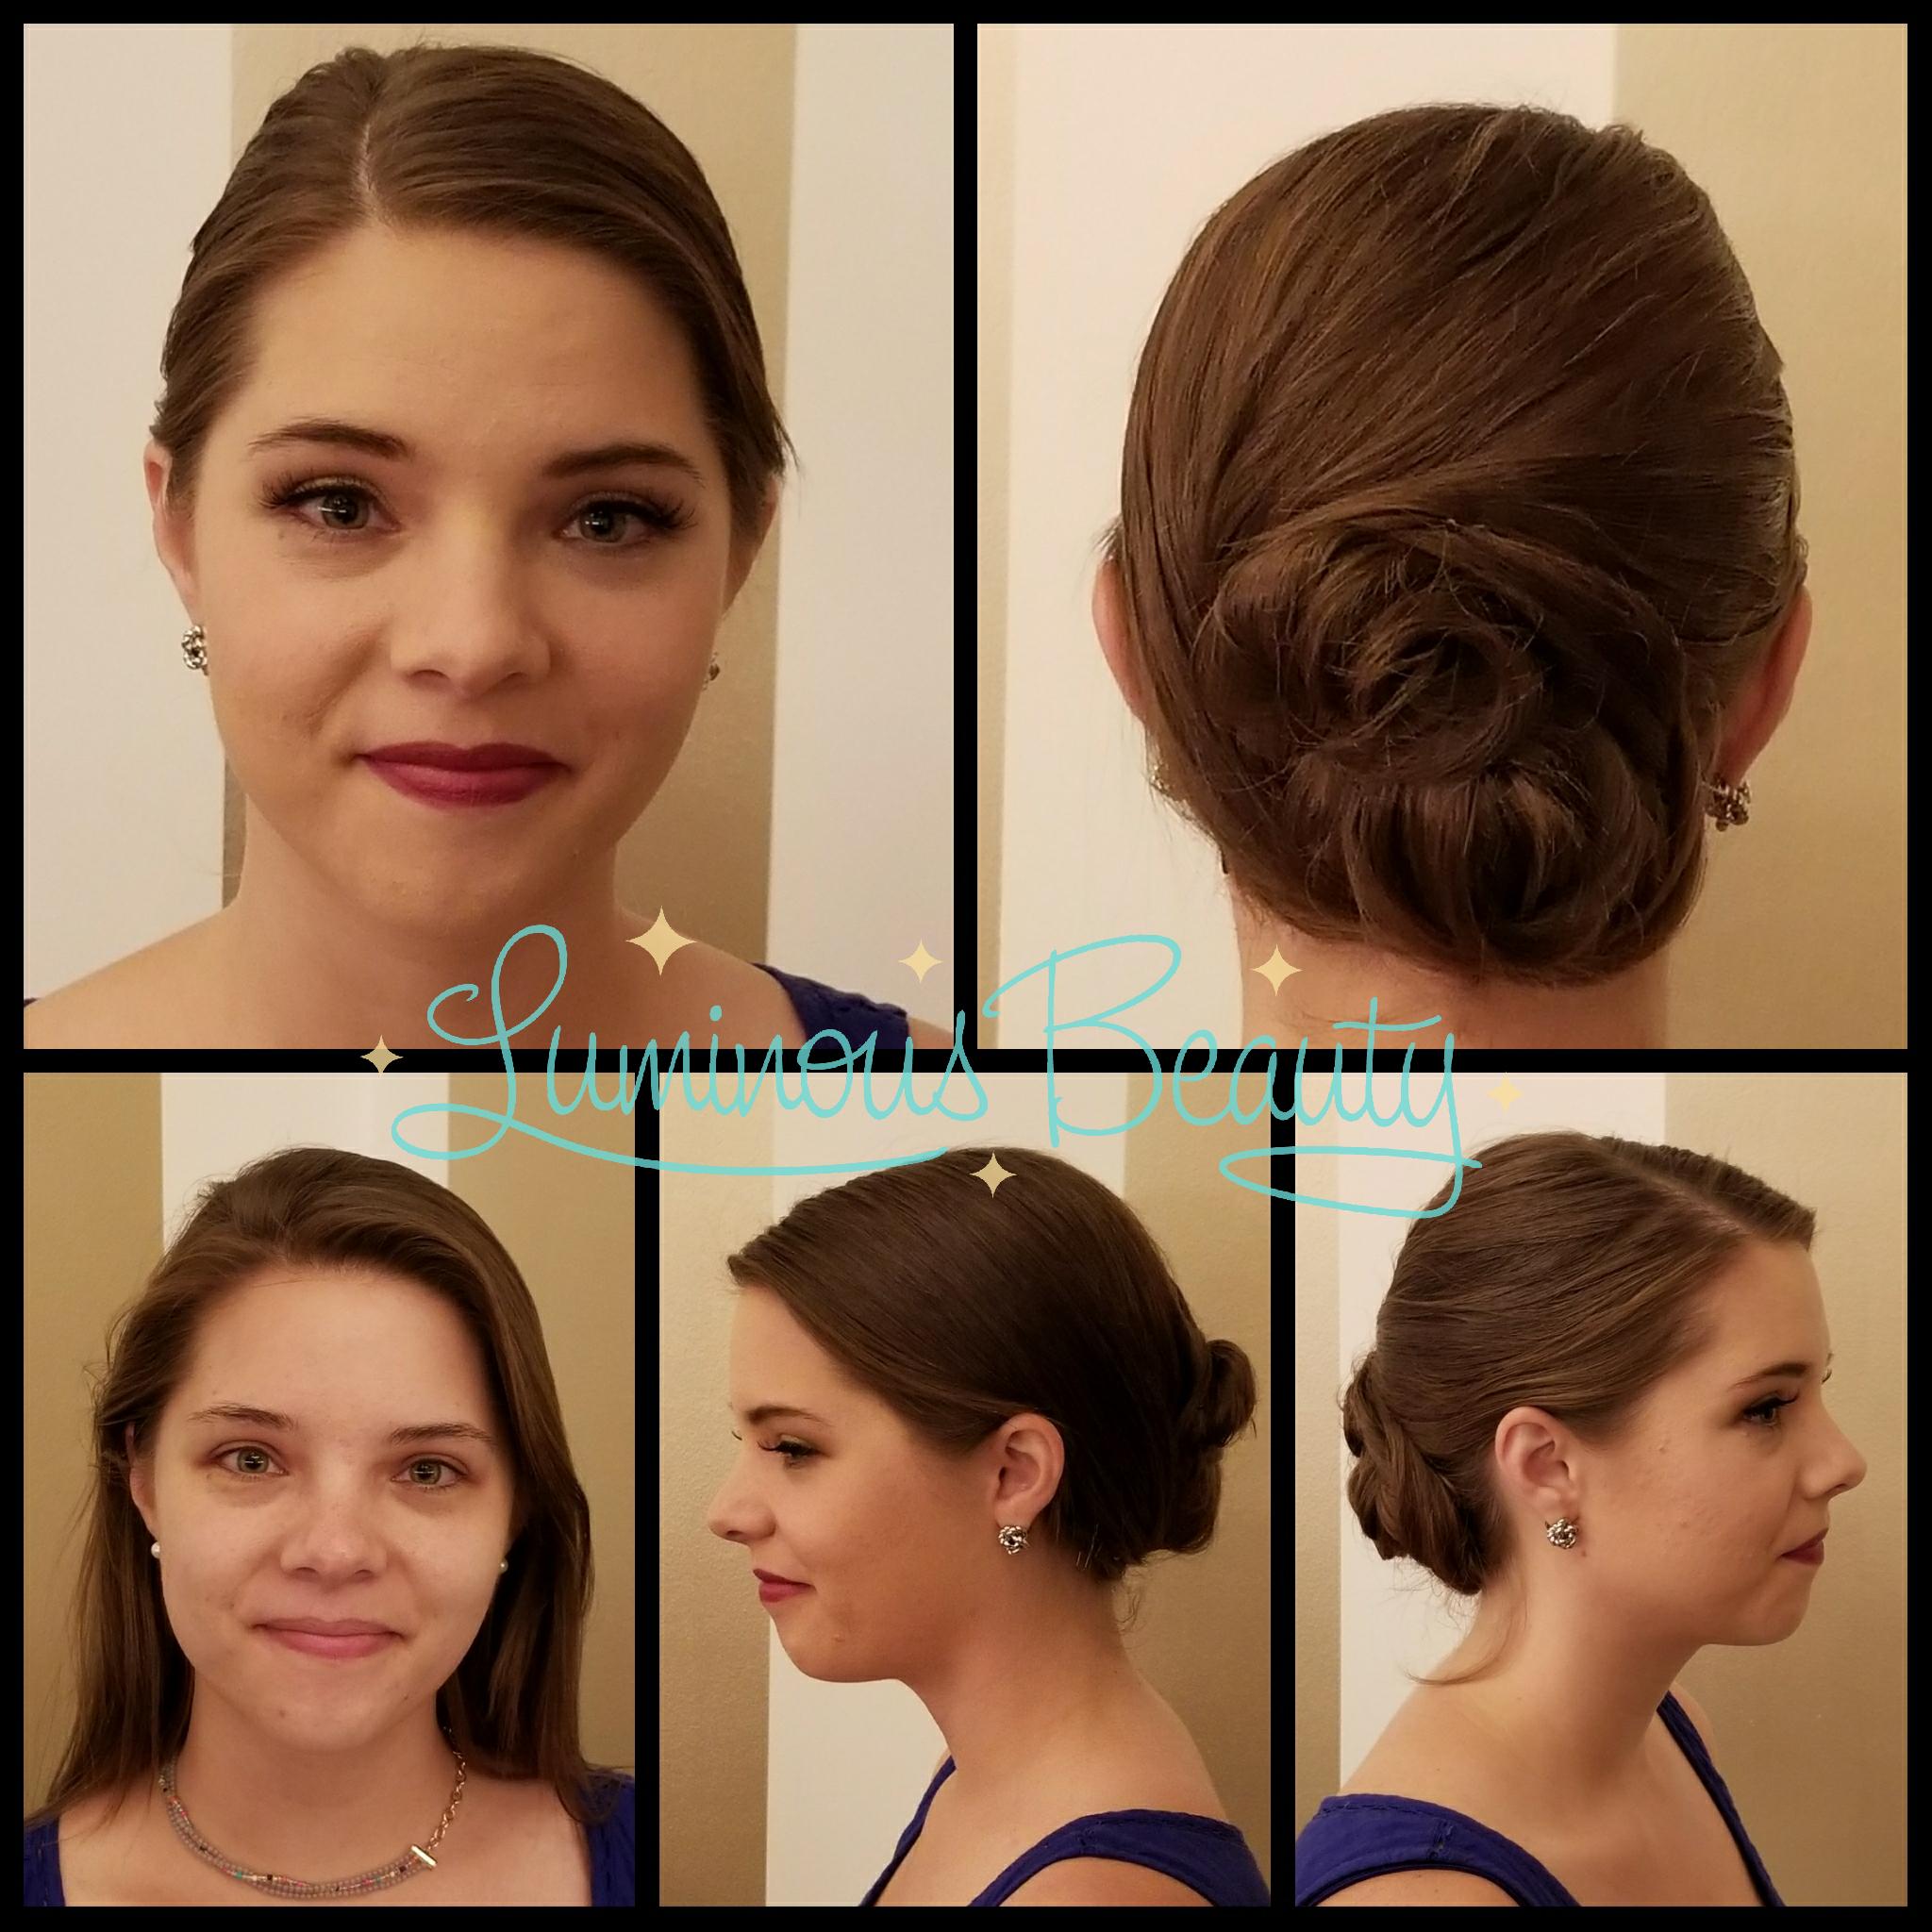 Chic, Simple Updo, Airbrush & False Lashes. Luminous Beauty Hair & Makeup.png